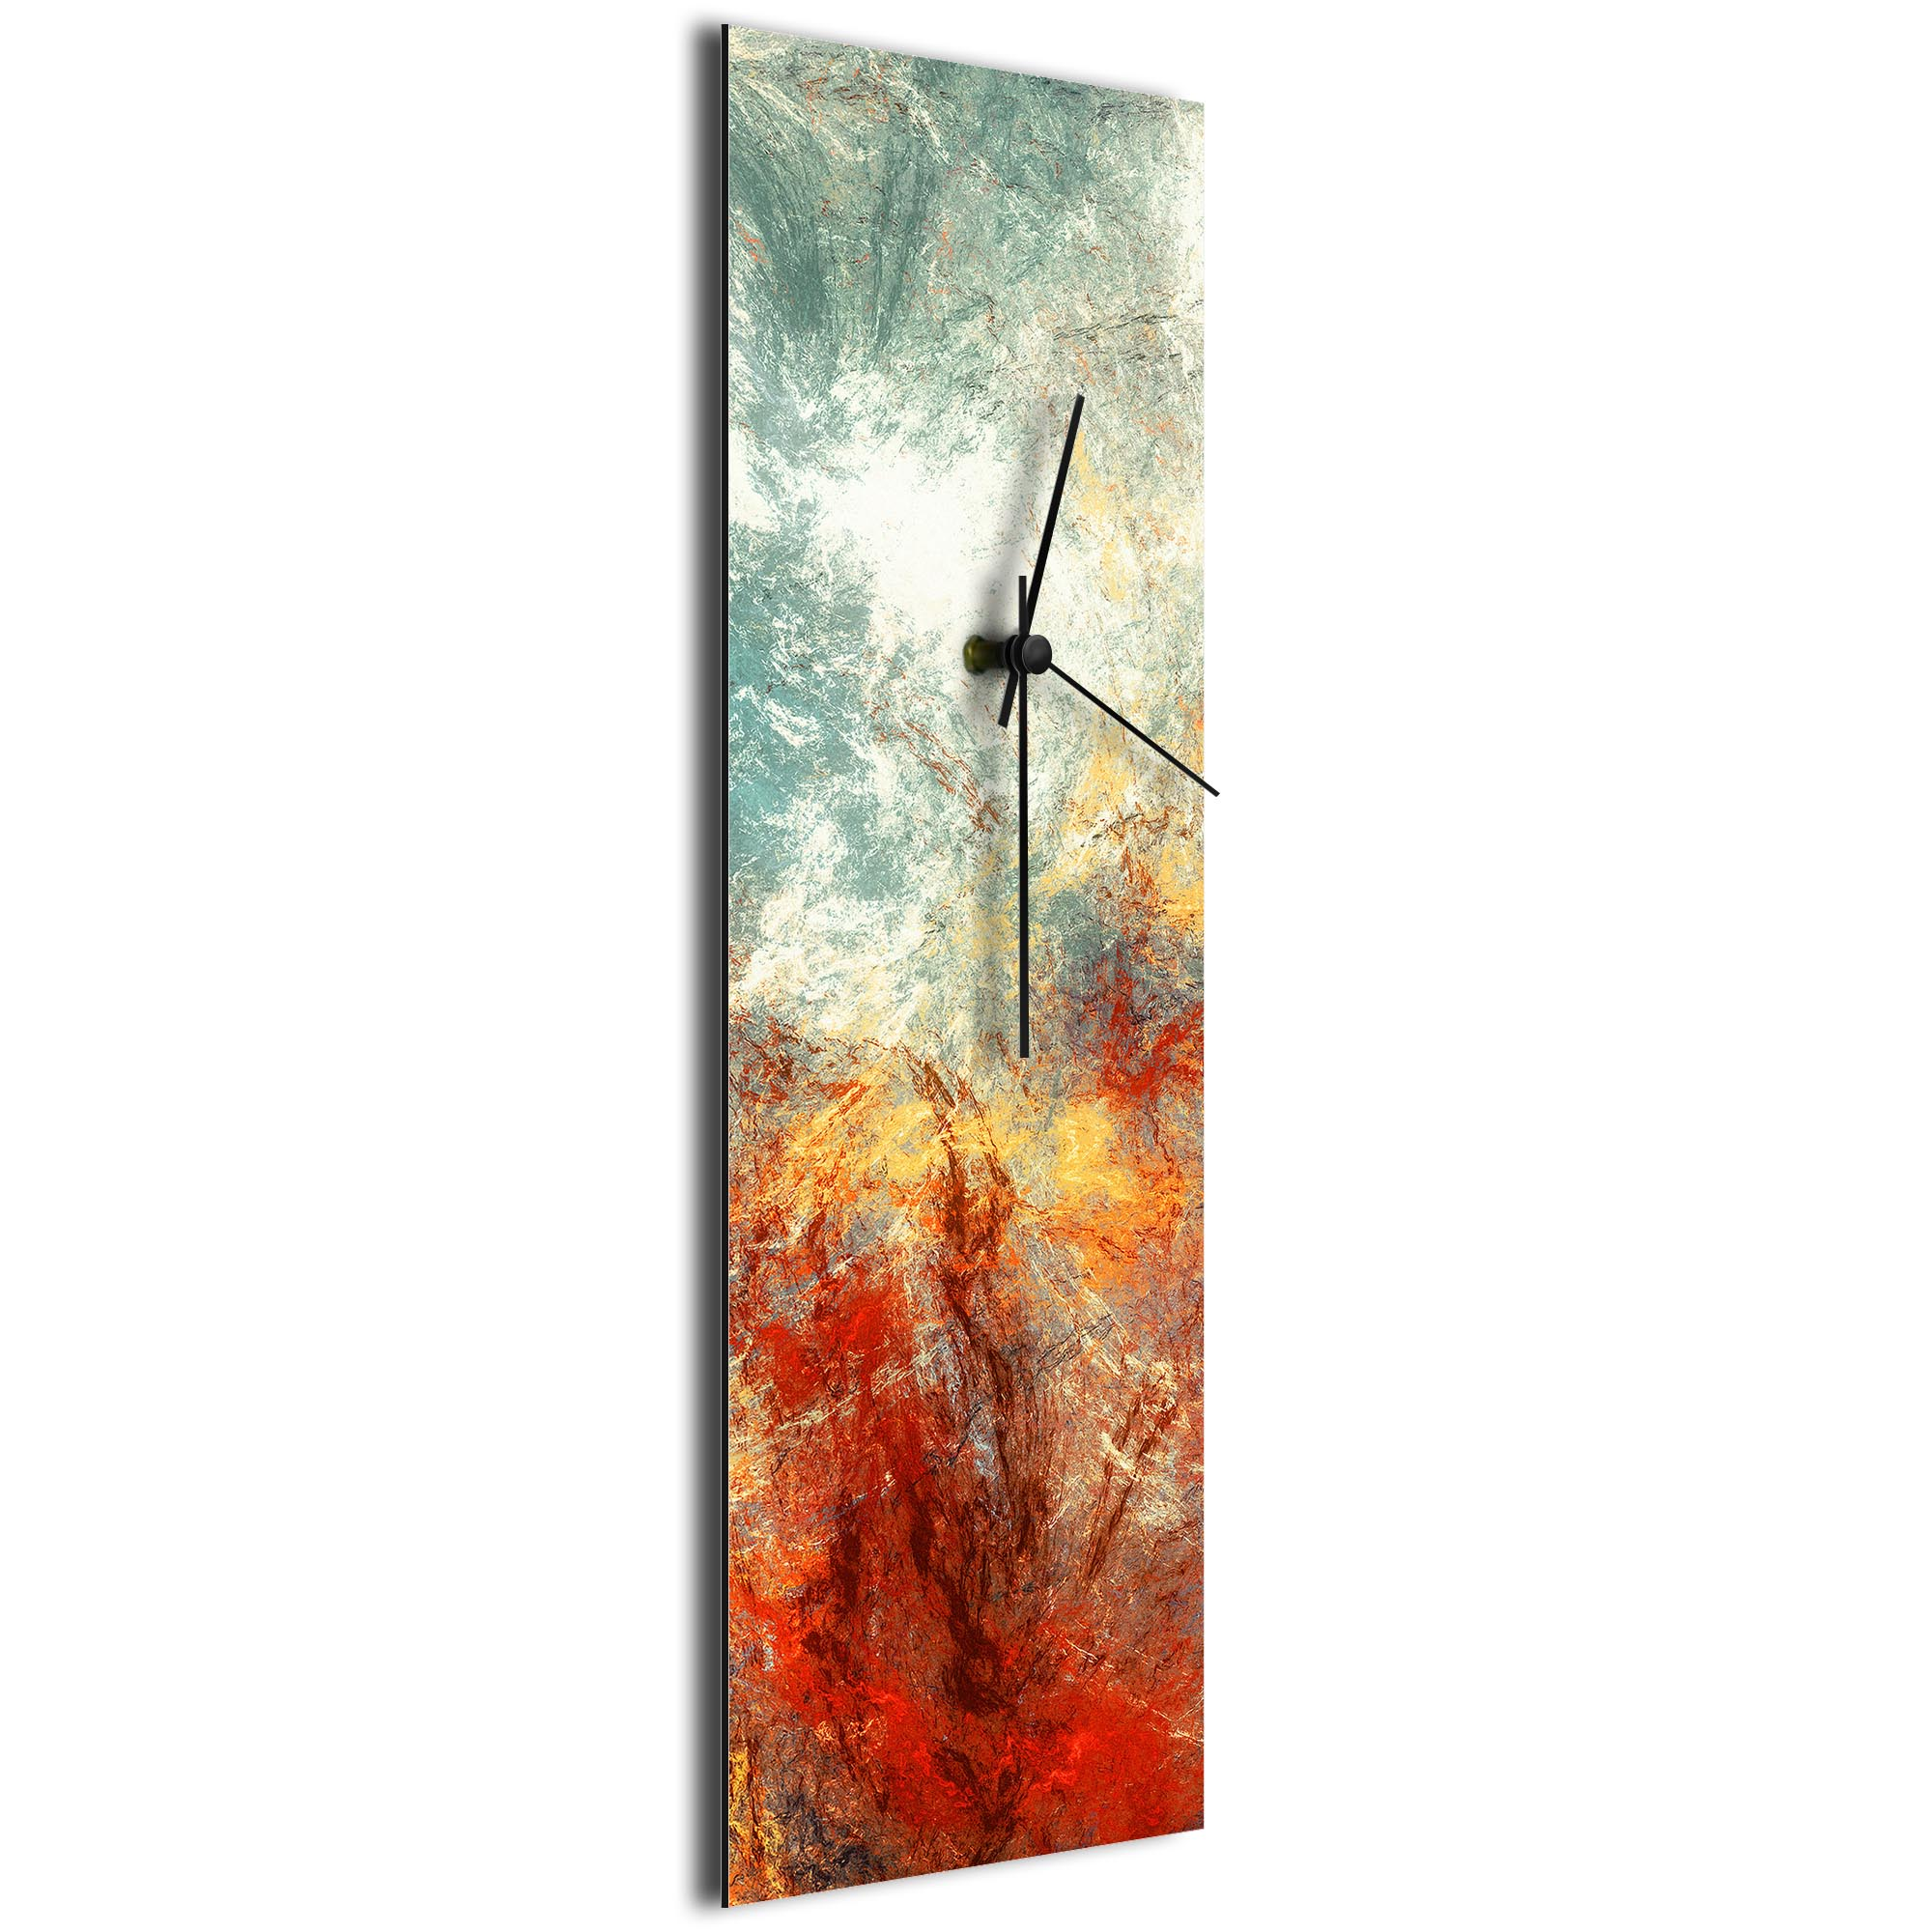 Sentinal Clock v4 by NAY - Distressed Modern Wall Clock - Image 2